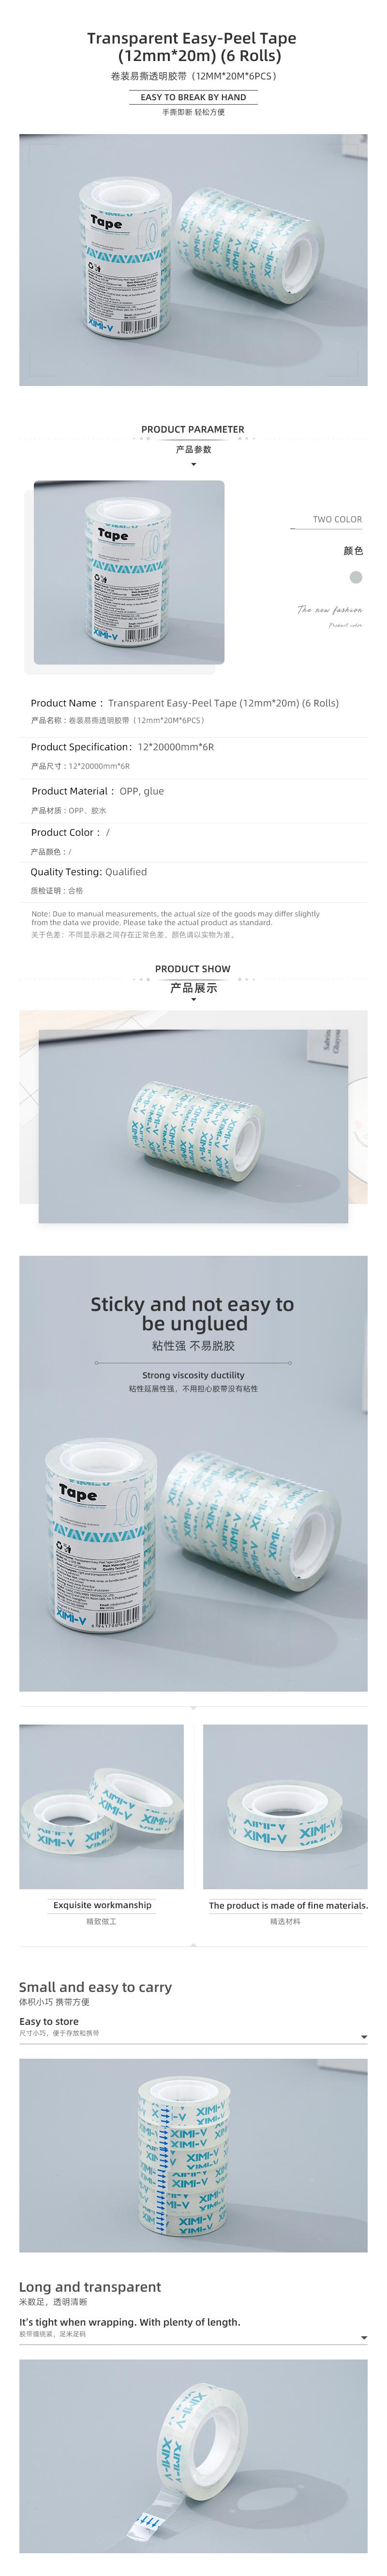 Transparent Easy-Peel Tape (12mm*20m) (6 Rolls) /></p> </div> </div> </div> <div class=